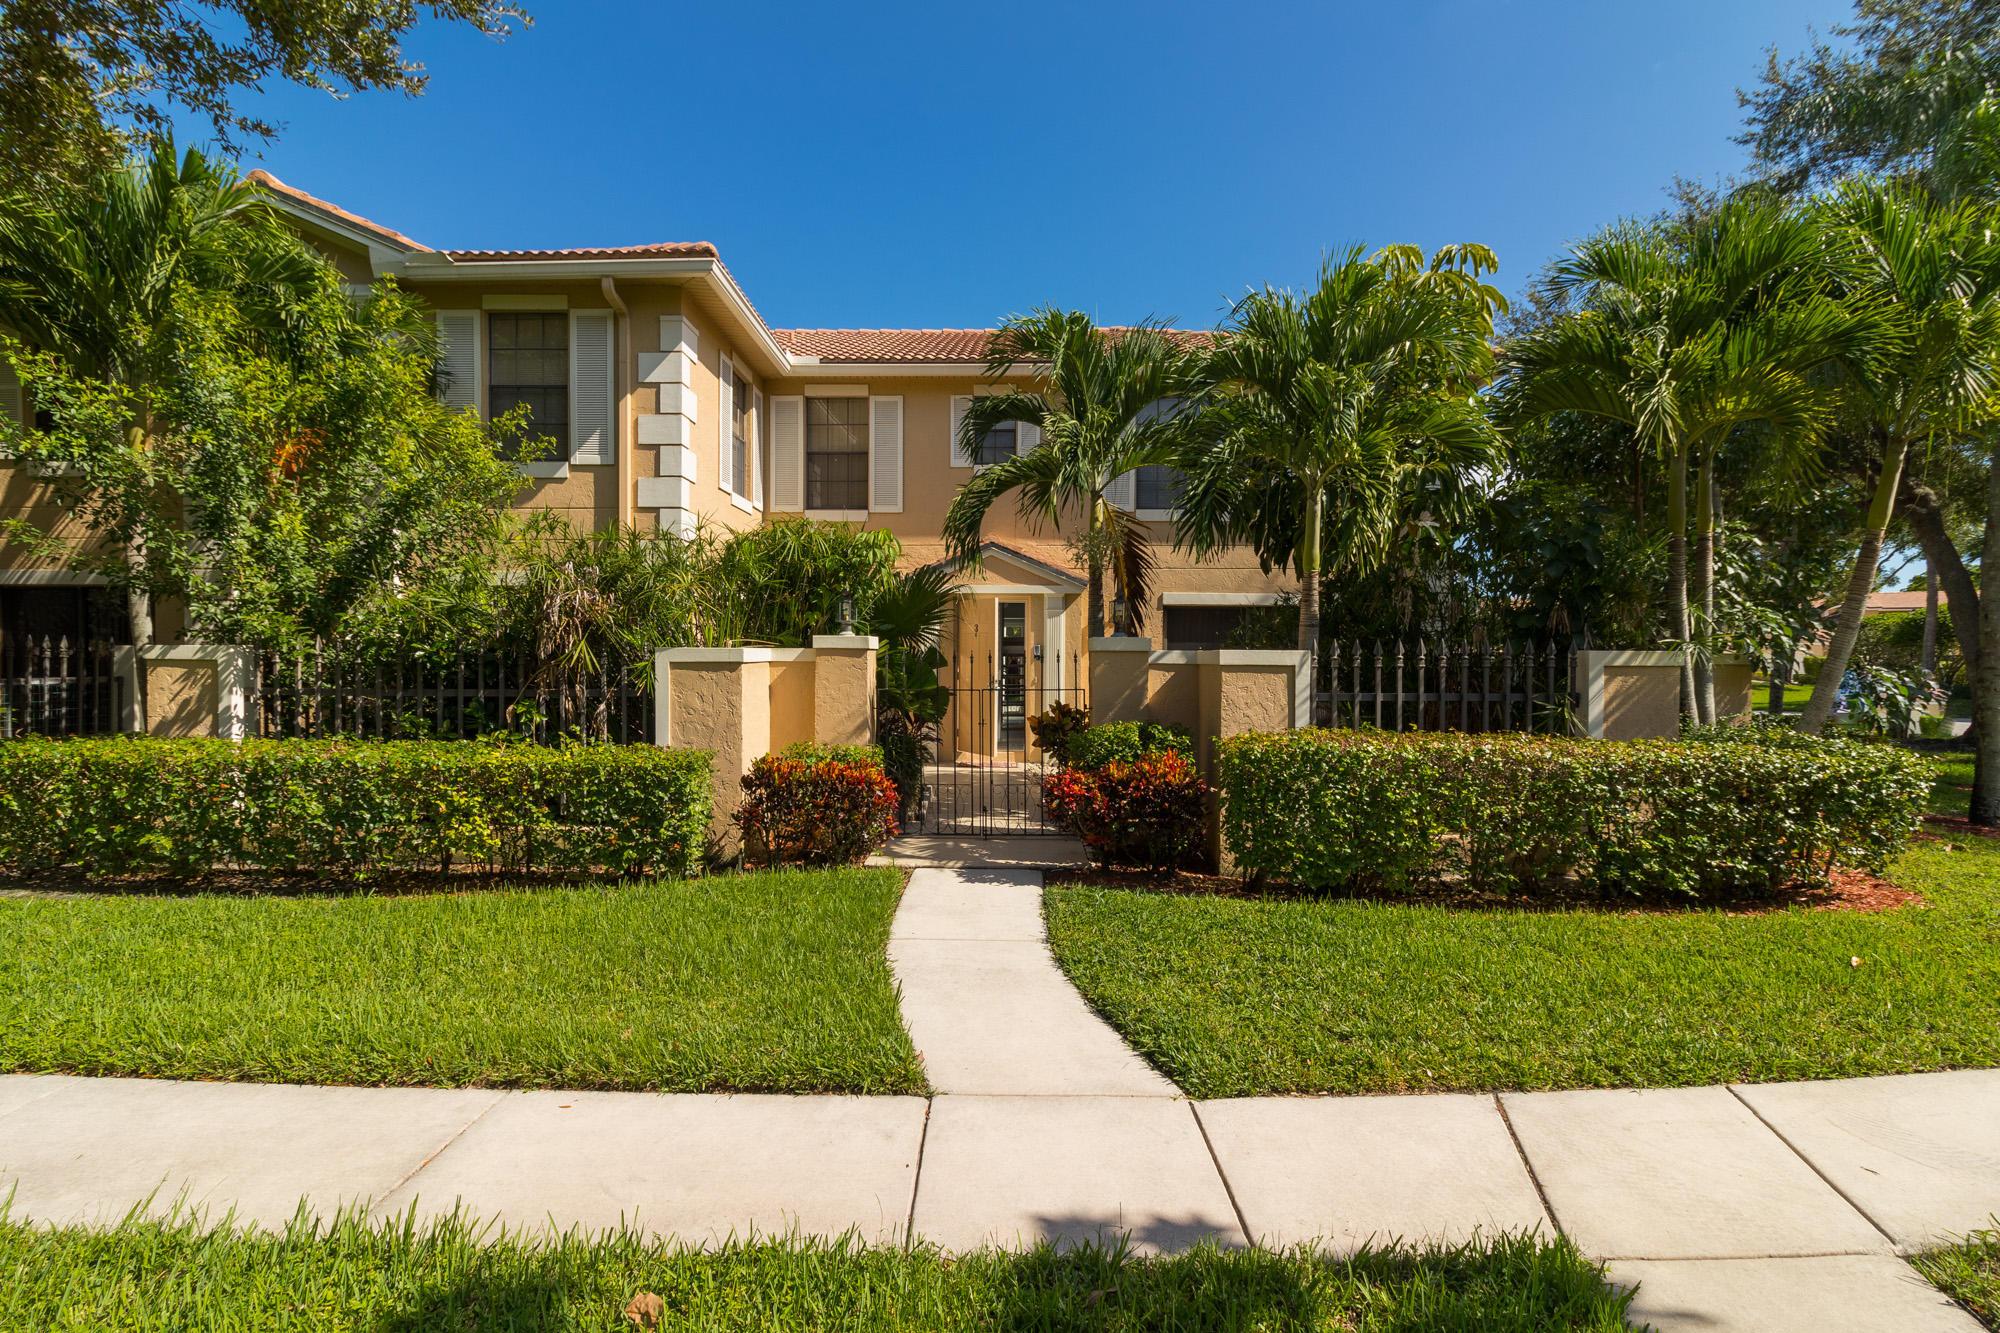 351 Prestwick Circle 3, Palm Beach Gardens, Florida 33418, 2 Bedrooms Bedrooms, ,3 BathroomsBathrooms,F,Townhouse,Prestwick,RX-10566170